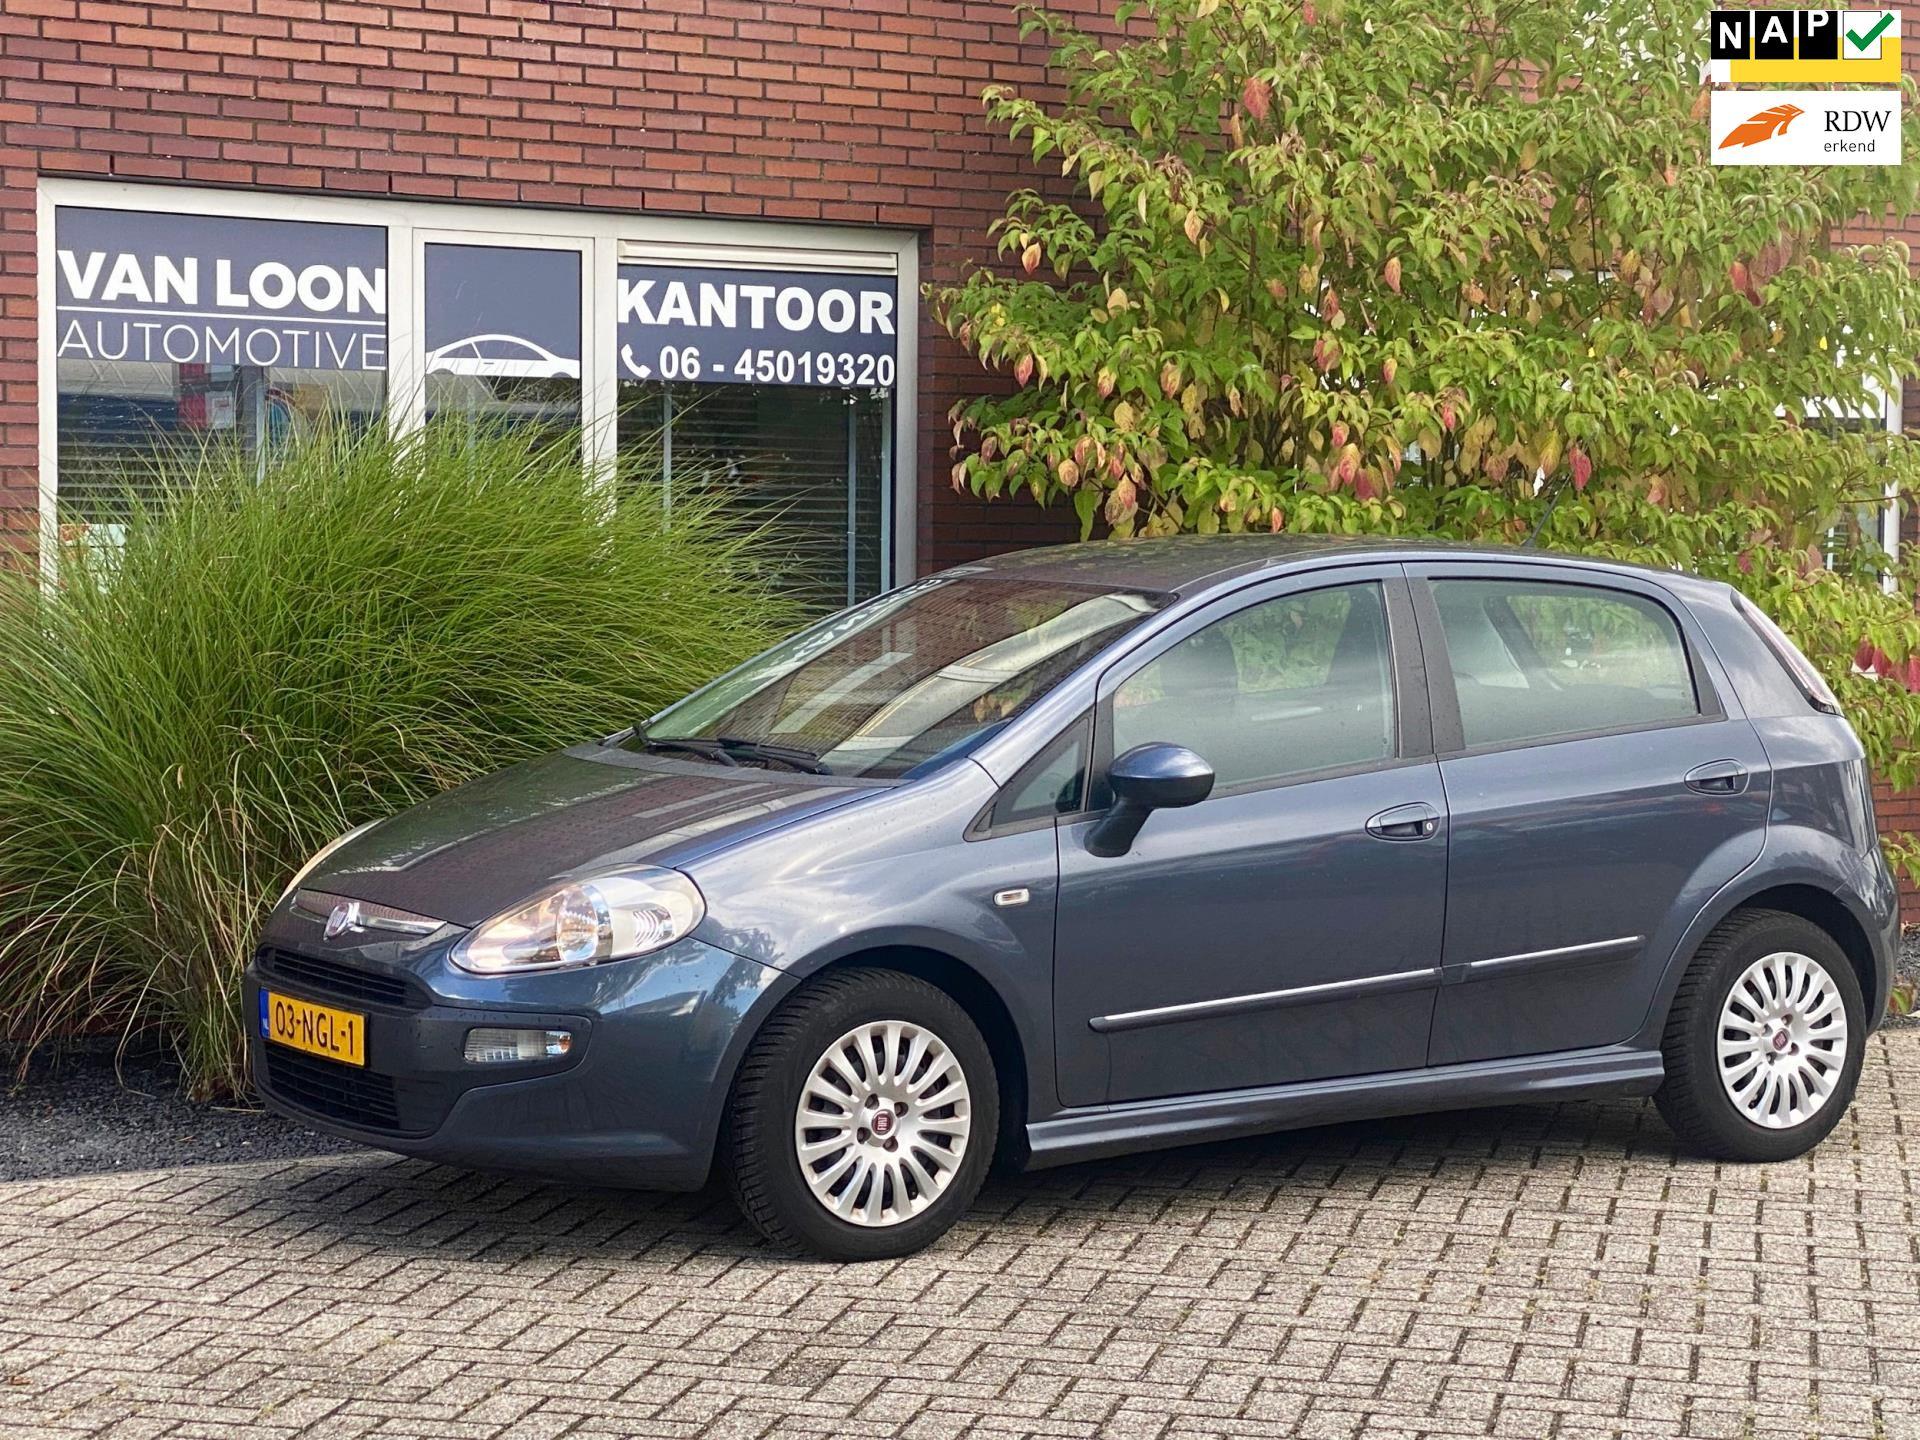 Fiat Punto Evo occasion - Van Loon Automotive